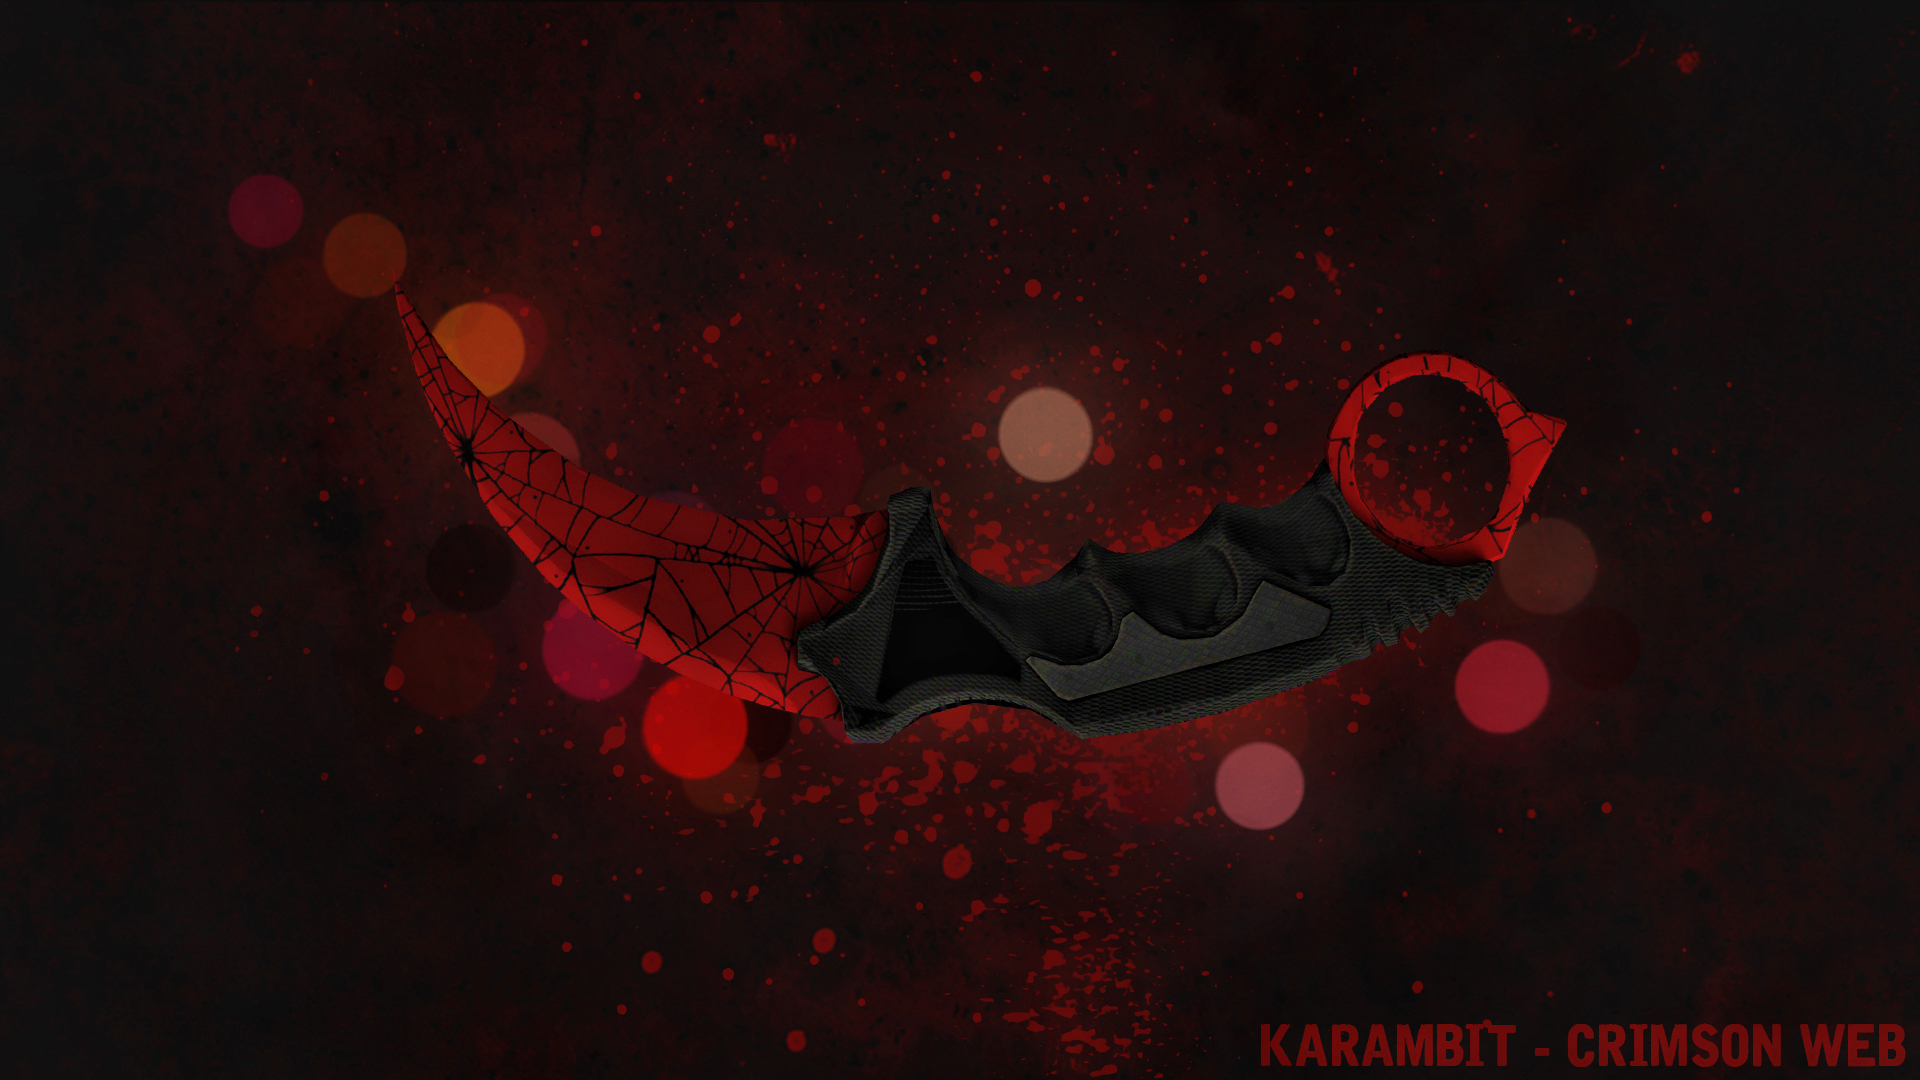 Karambit Crimson Web